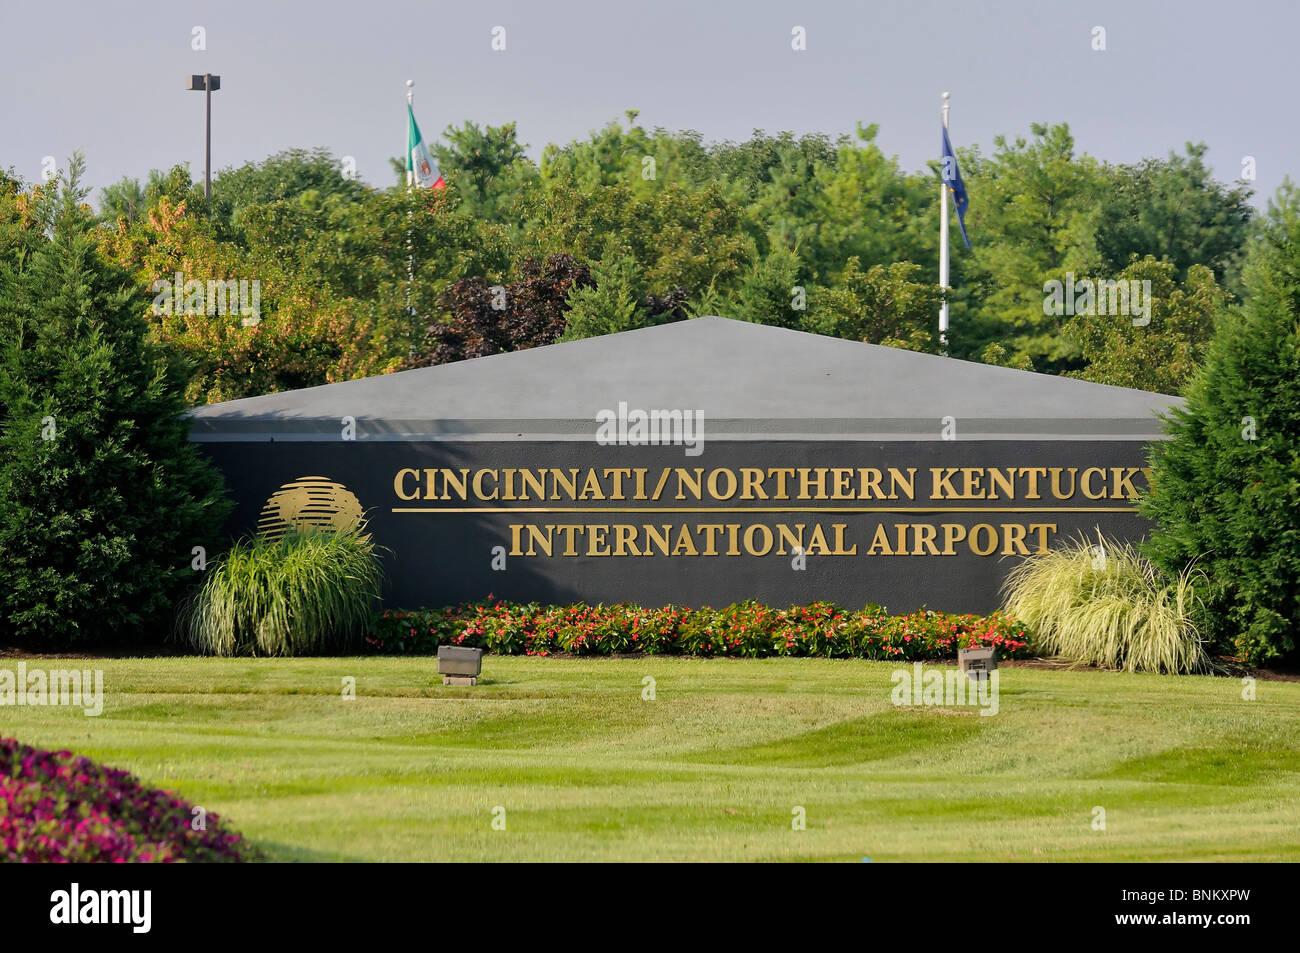 Entrance sign for the Cincinnati/Northern Kentucky International Airport Stock Photo